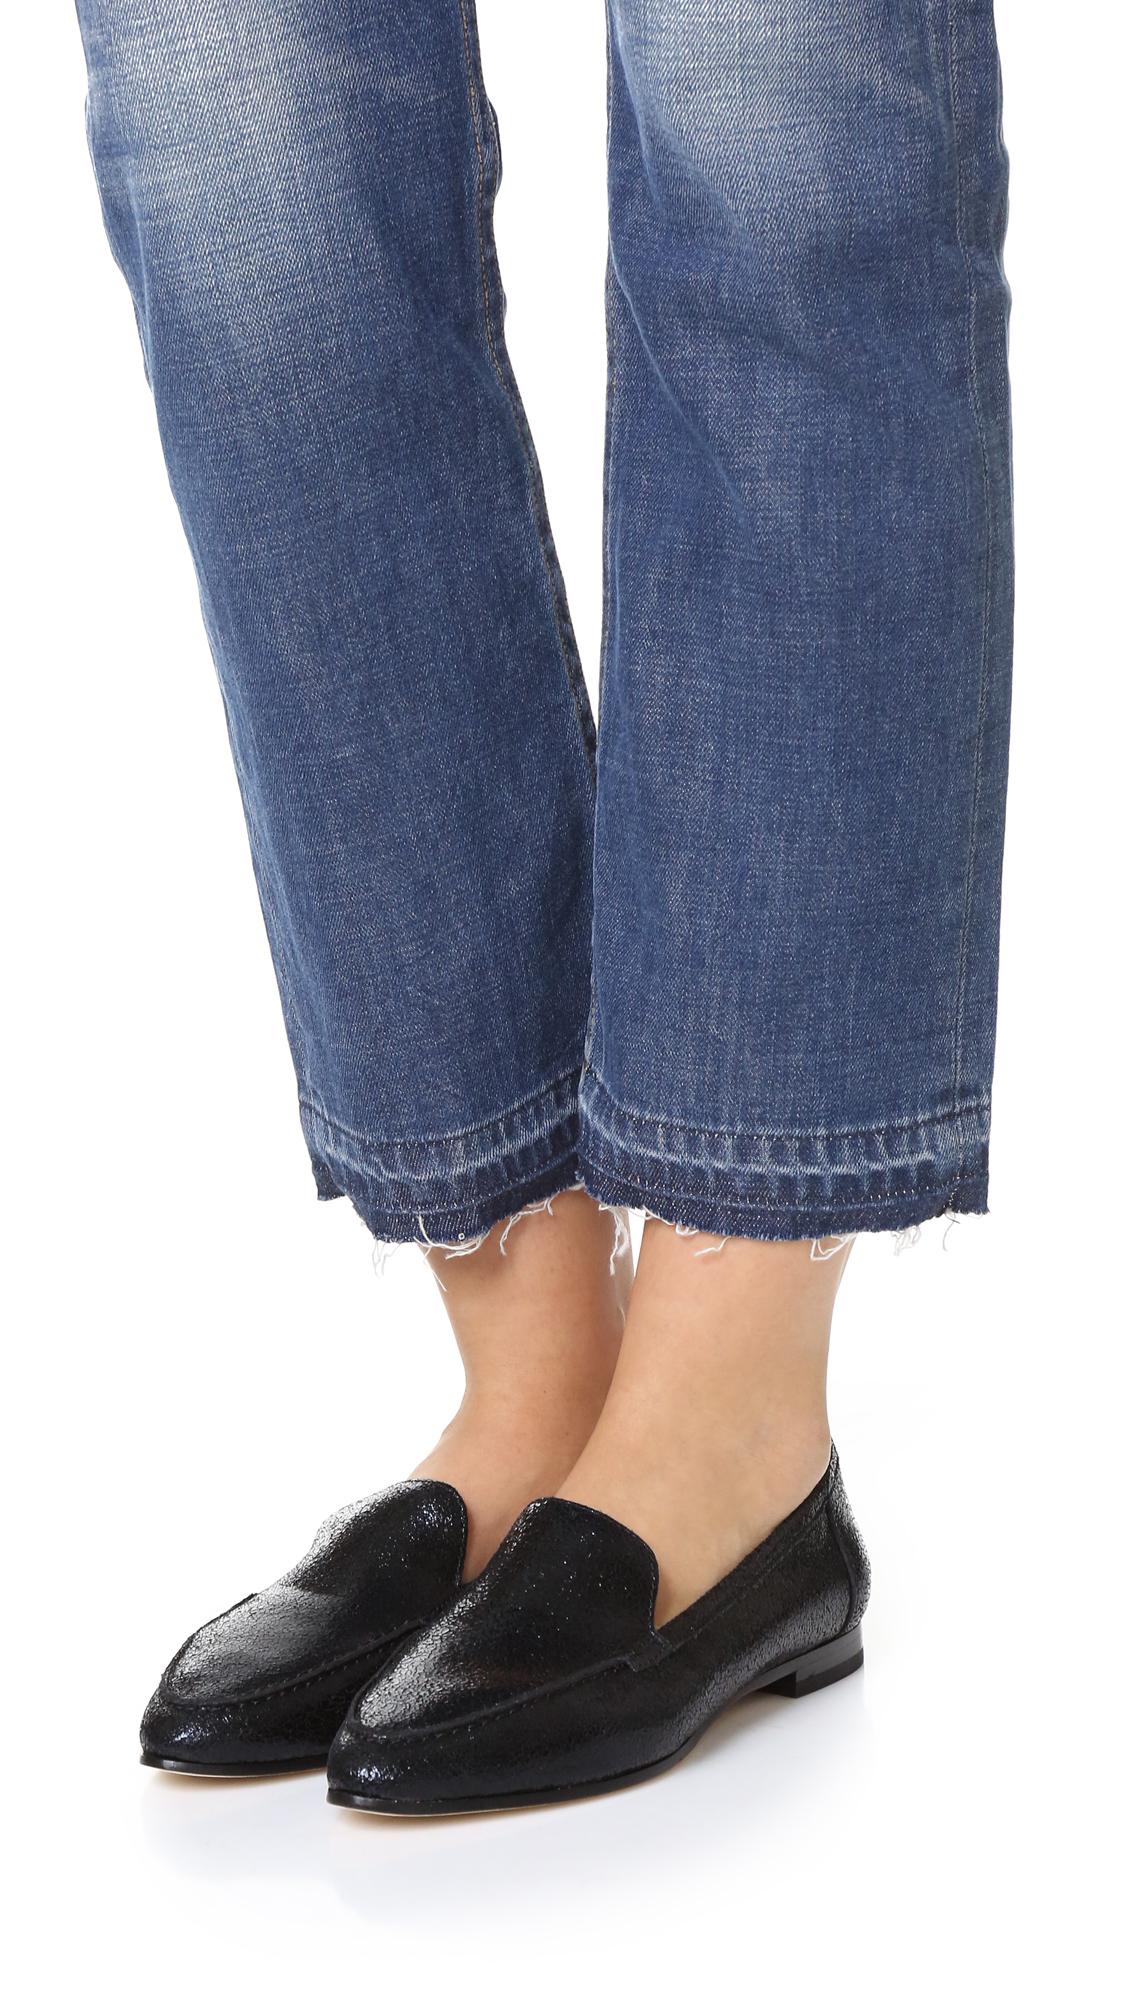 bbdd7420a6fa Kate Spade Carima Loafers in Black - Lyst